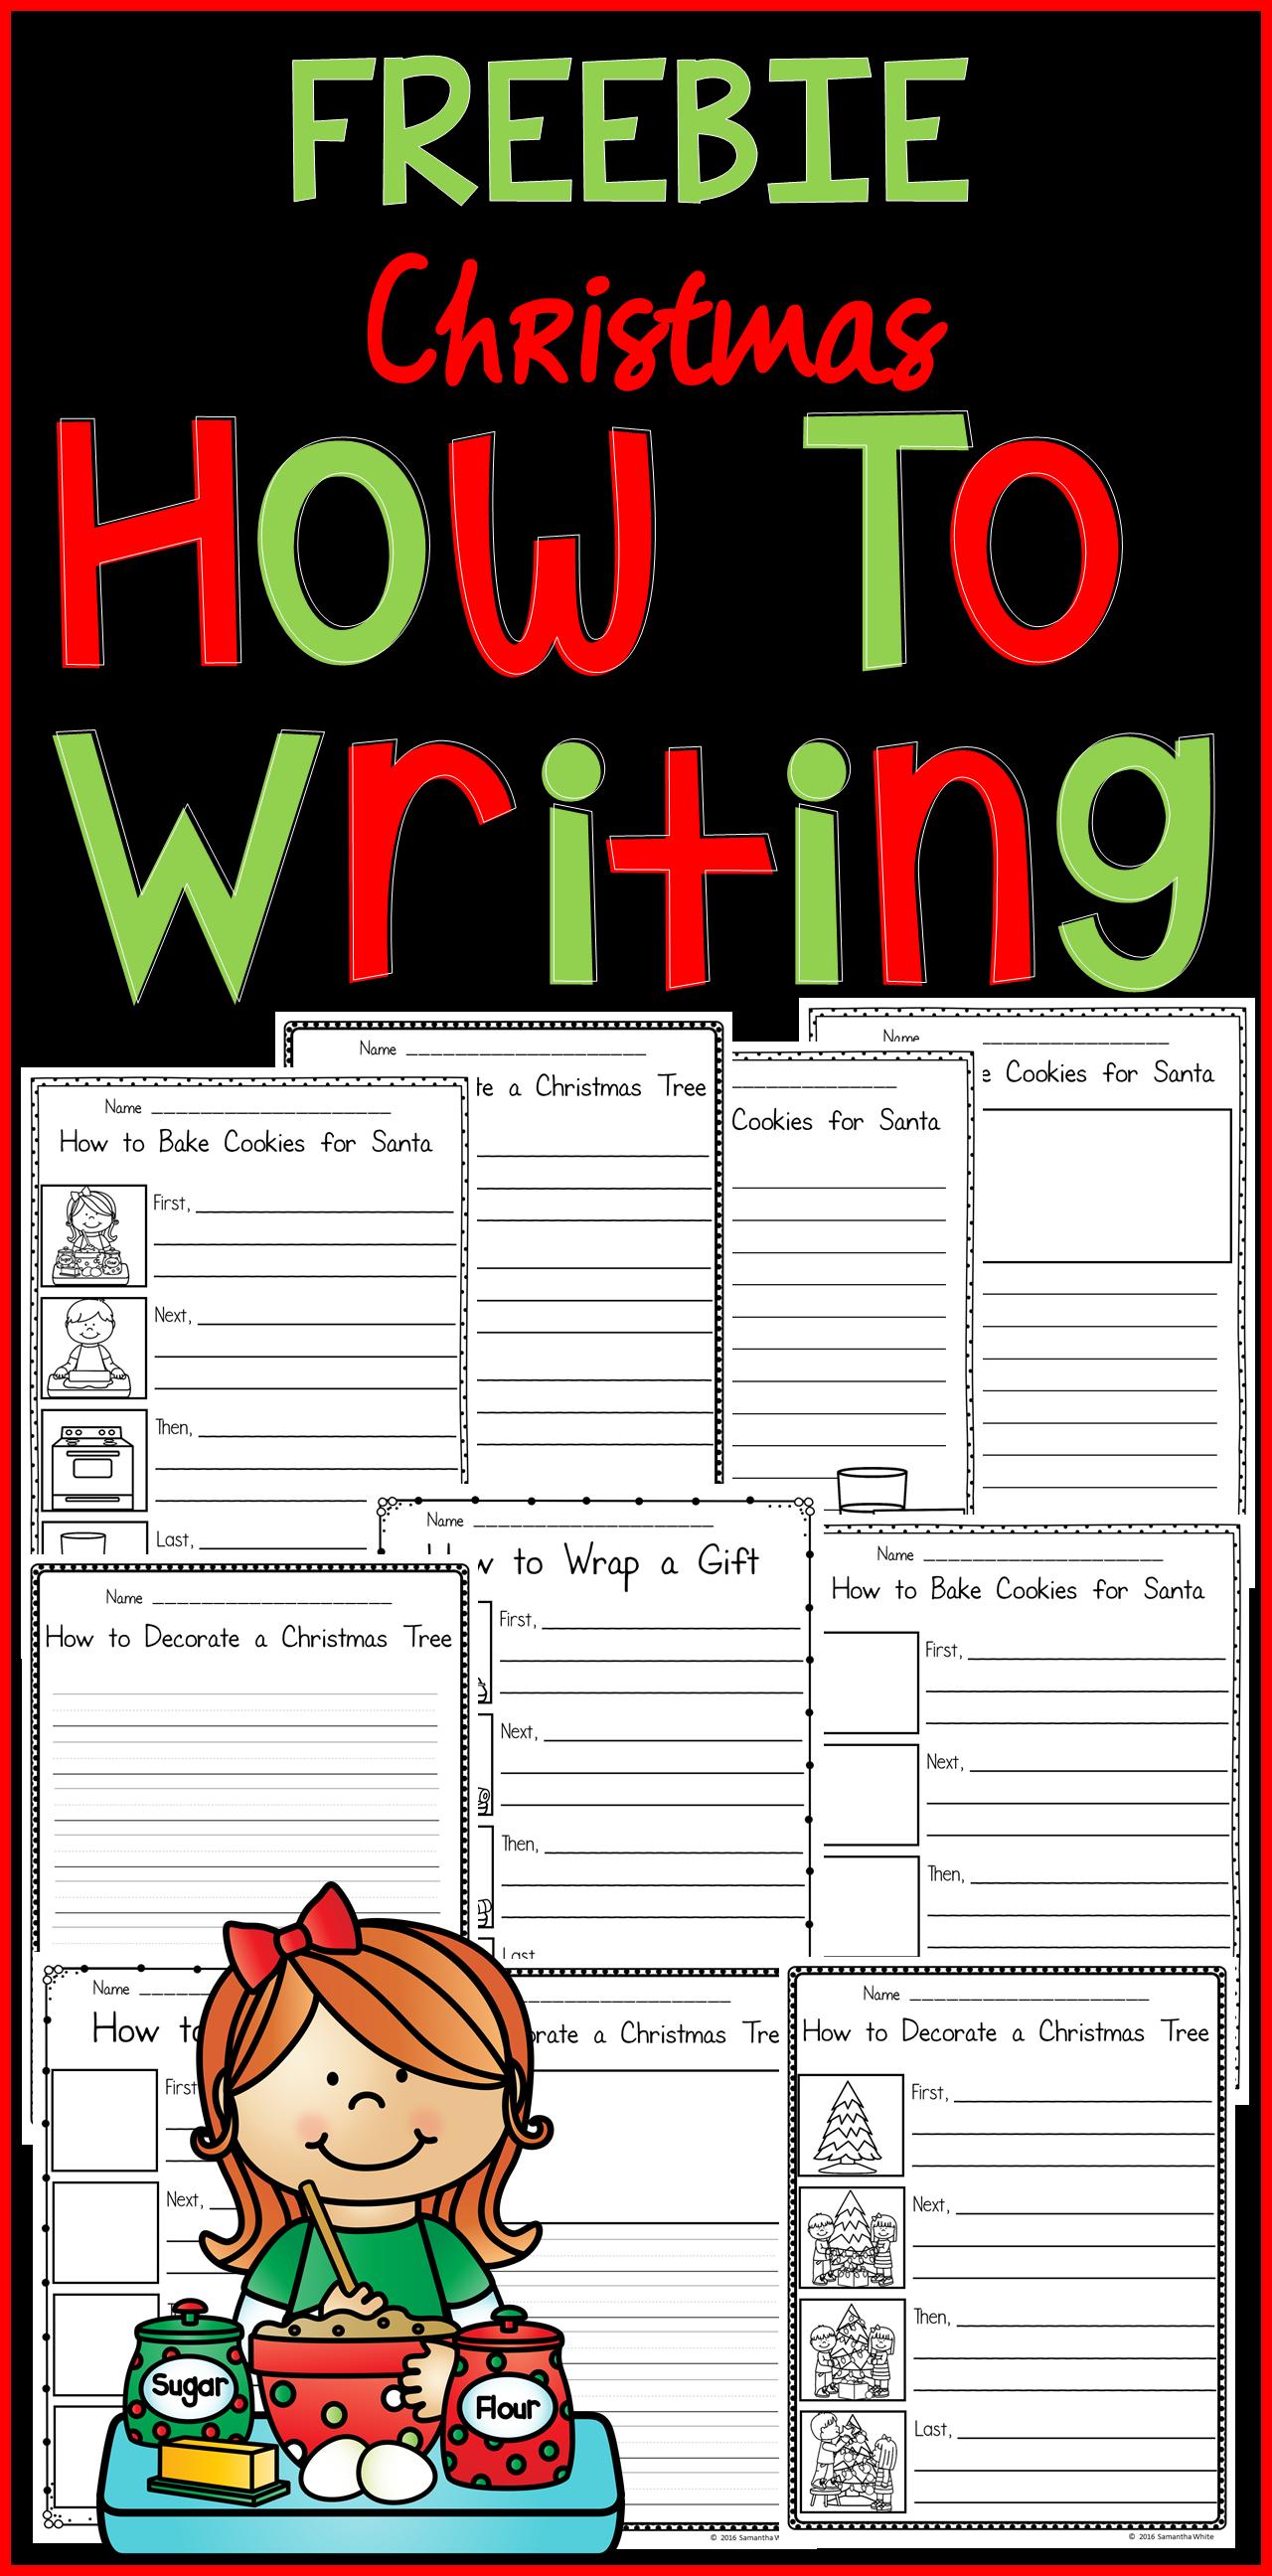 How To Writing Christmas Edition Freebie